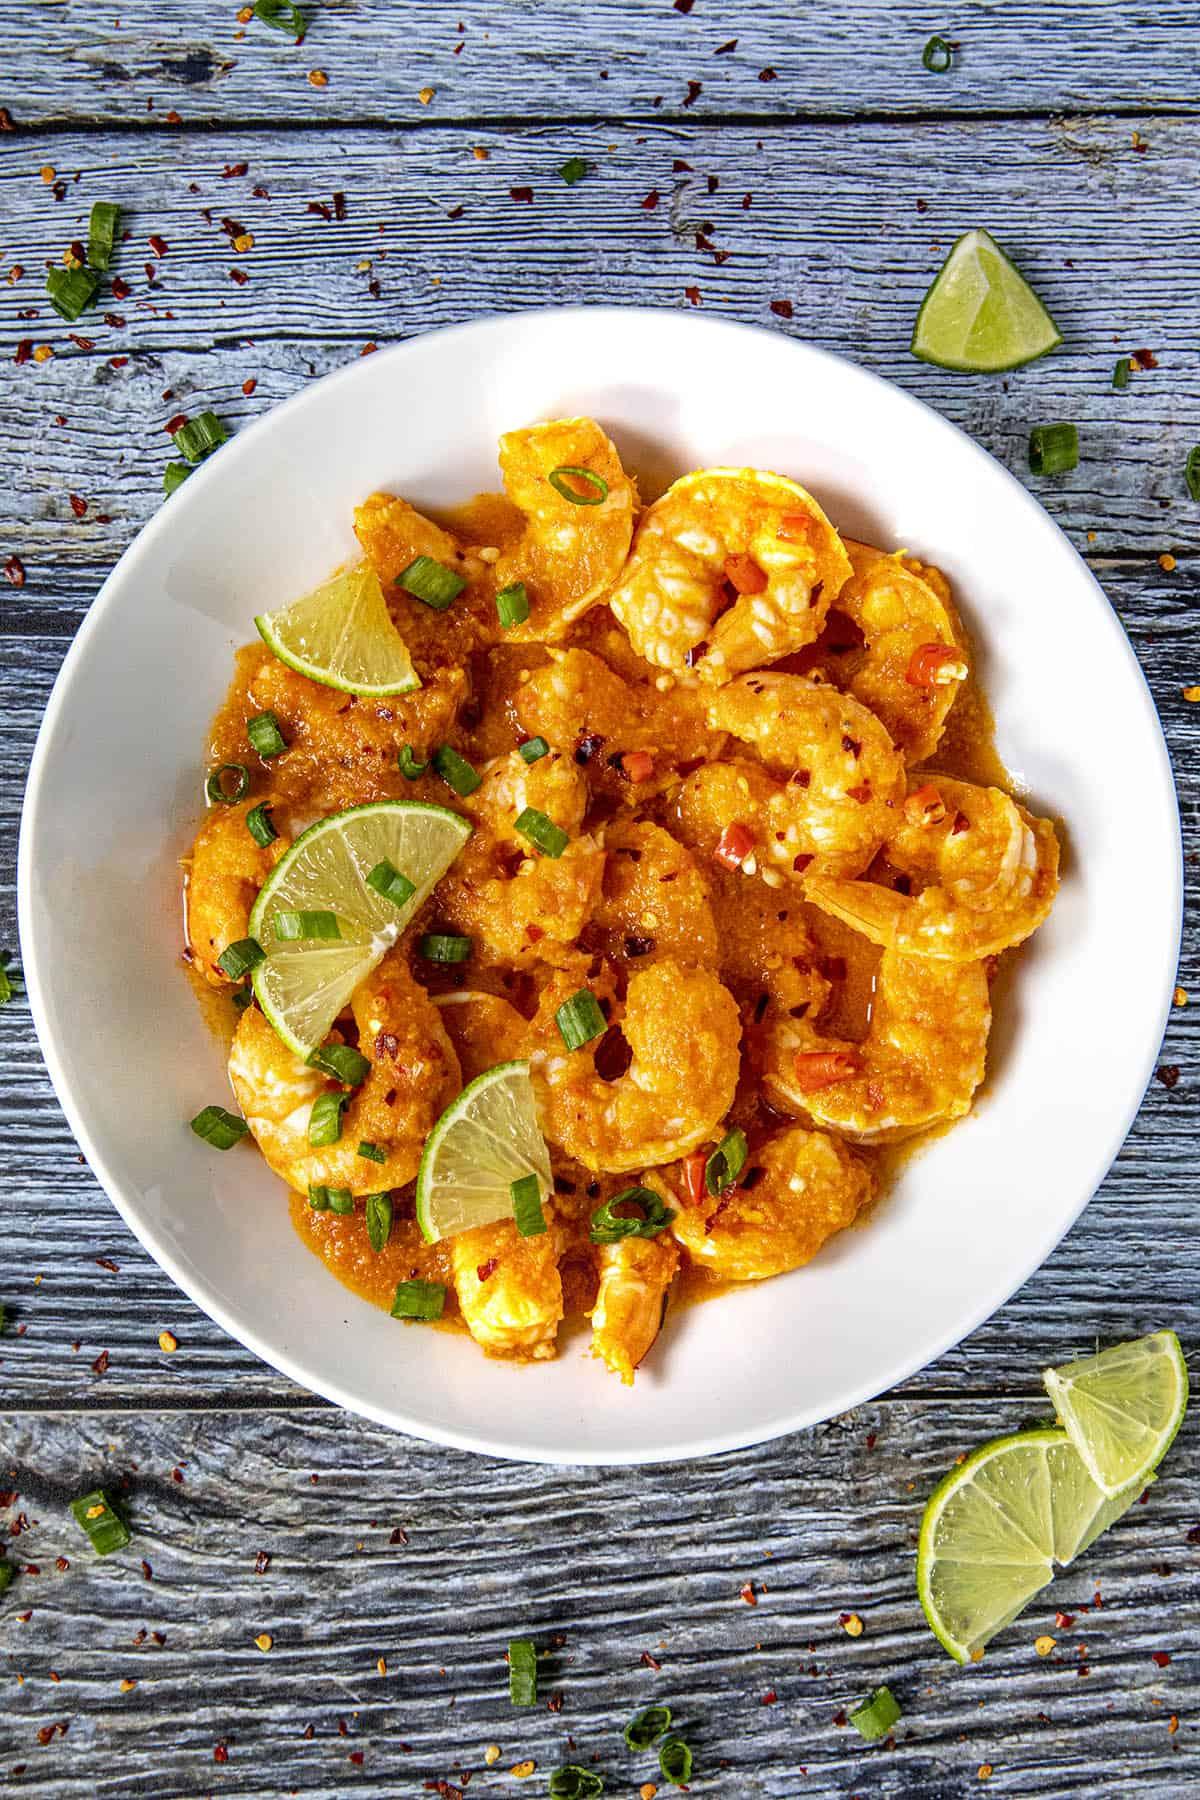 Mike ready to enjoy a bowl of Udang Balado Recipe (Indonesian Spicy Shrimp)